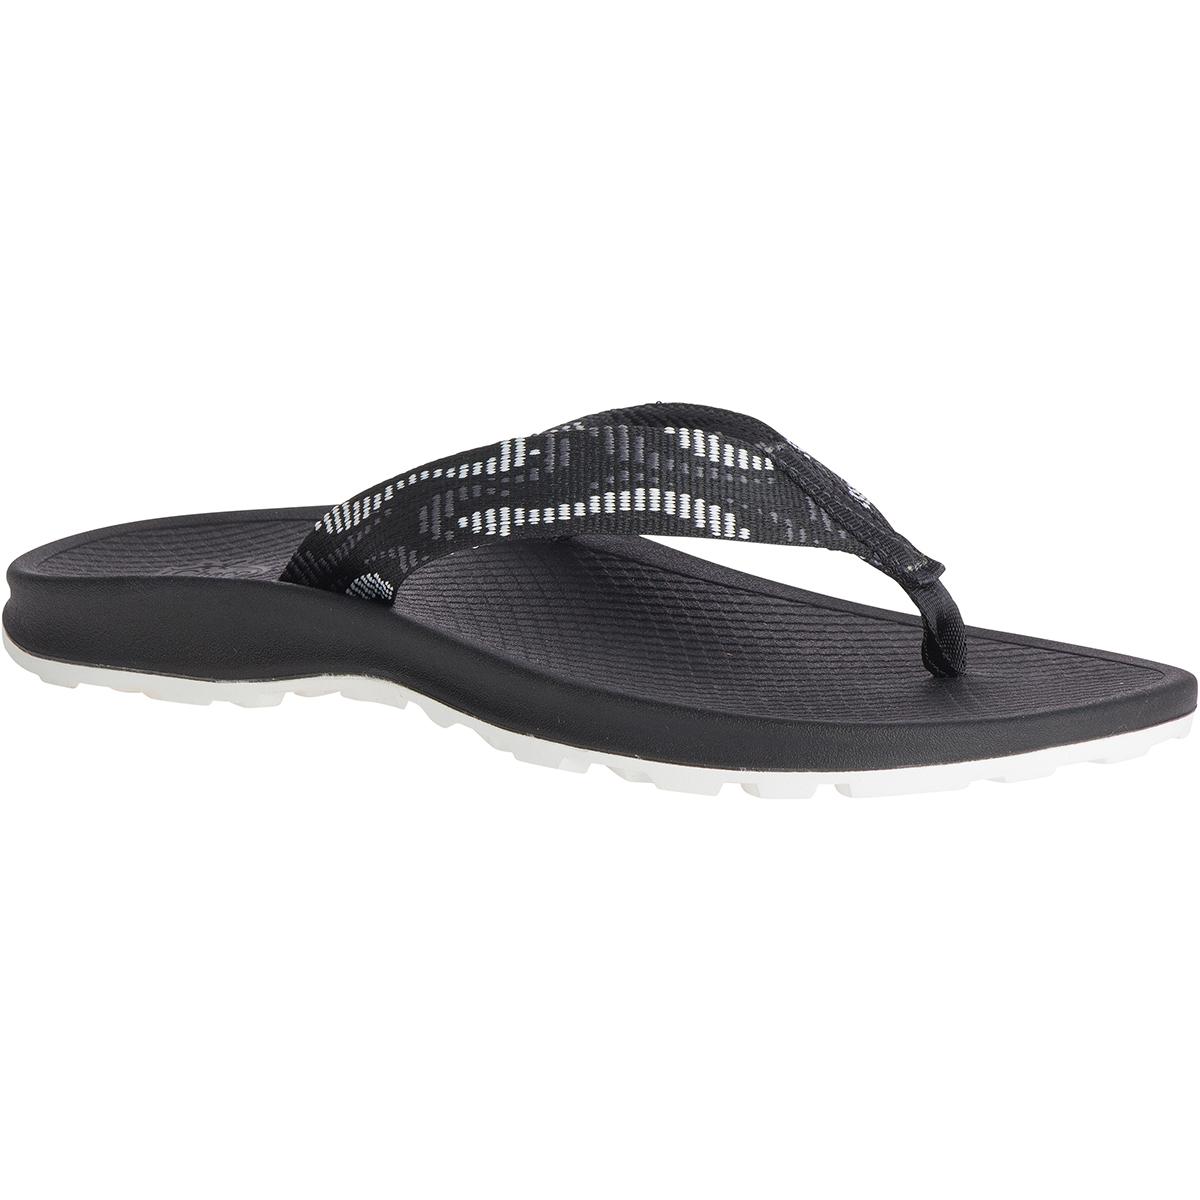 Chaco Women's Playa Pro Web Sandals - Black, 9